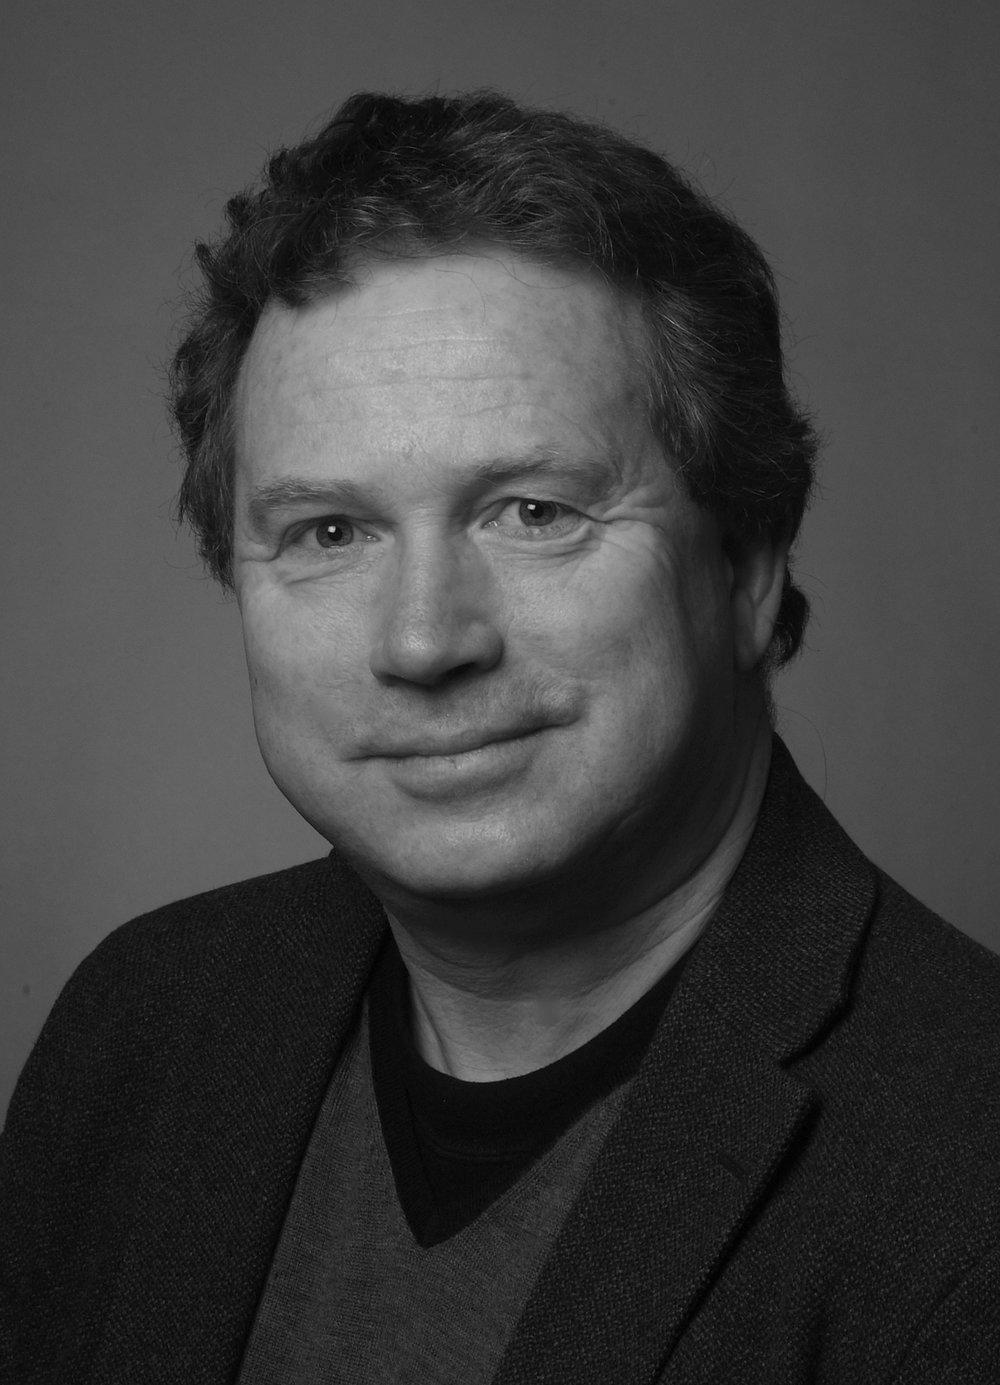 Arild Bjørn Larsen